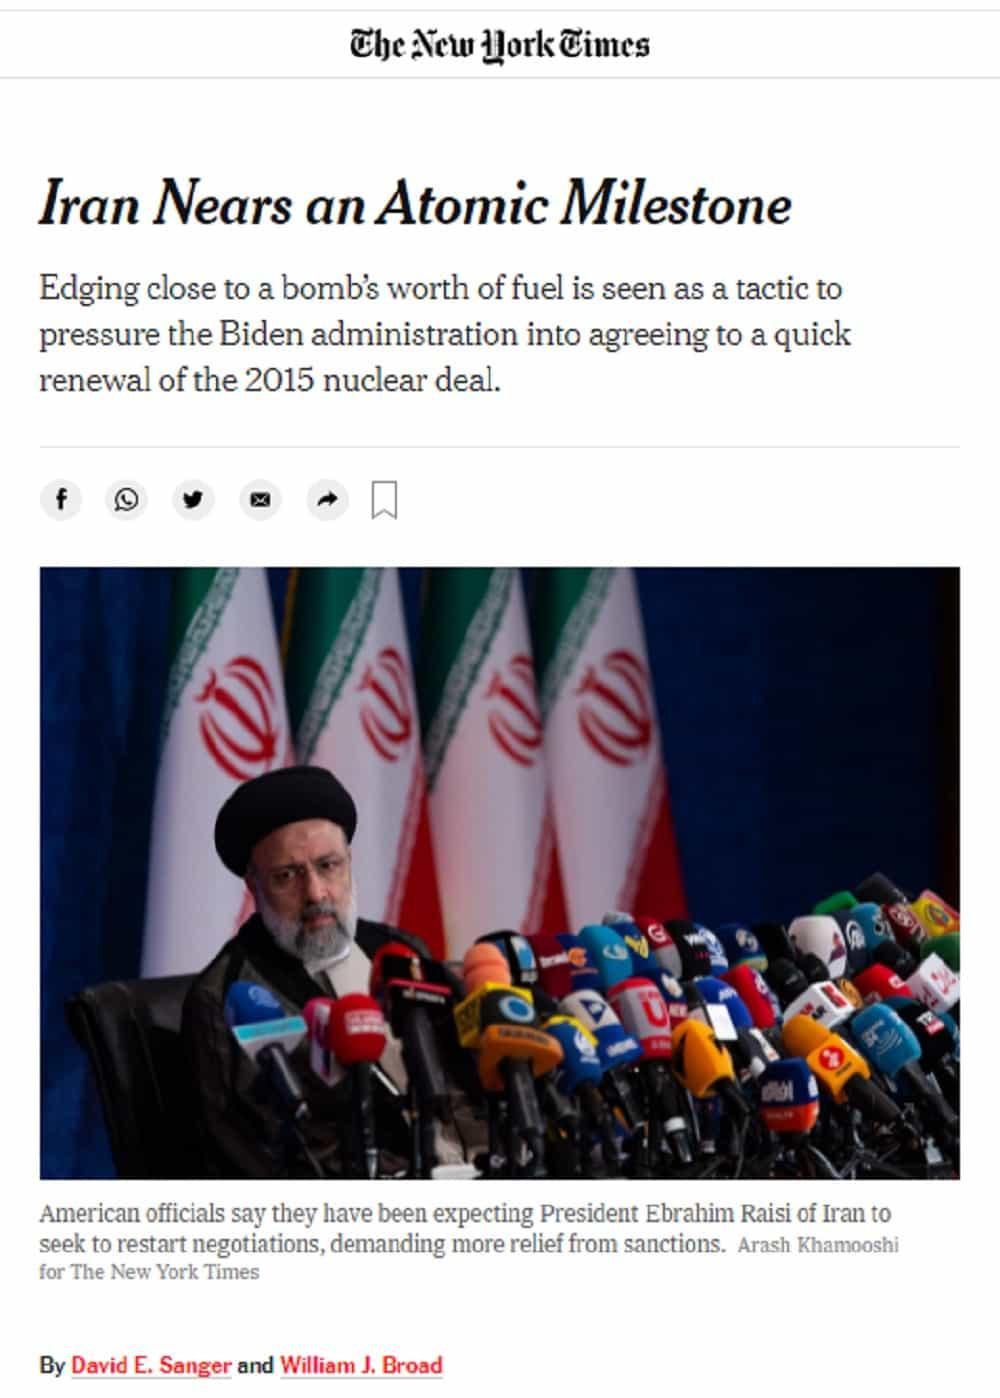 nyt-iran-article-nuclear-14092021-min